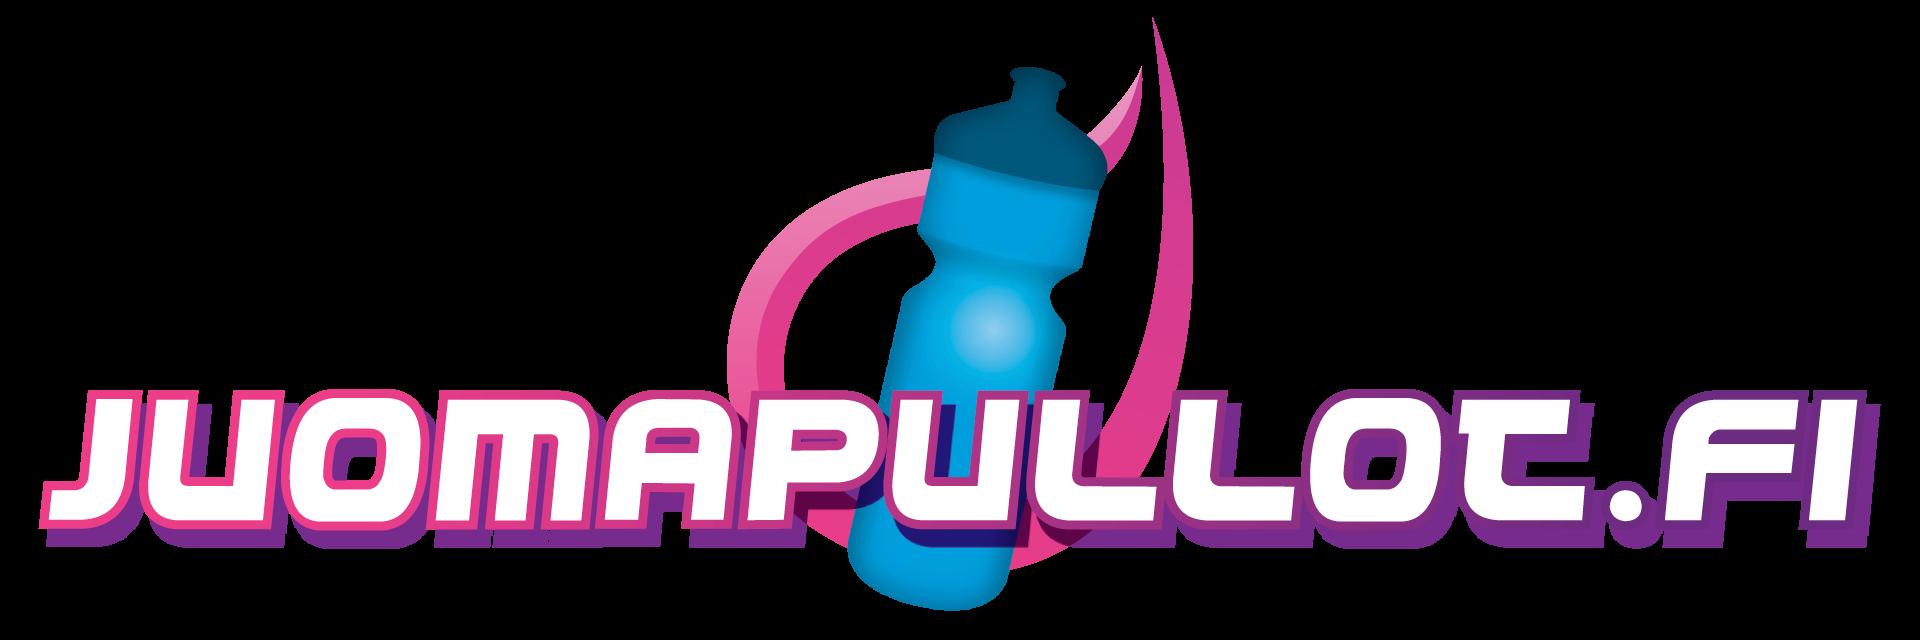 Juomapullot omalla logolla.